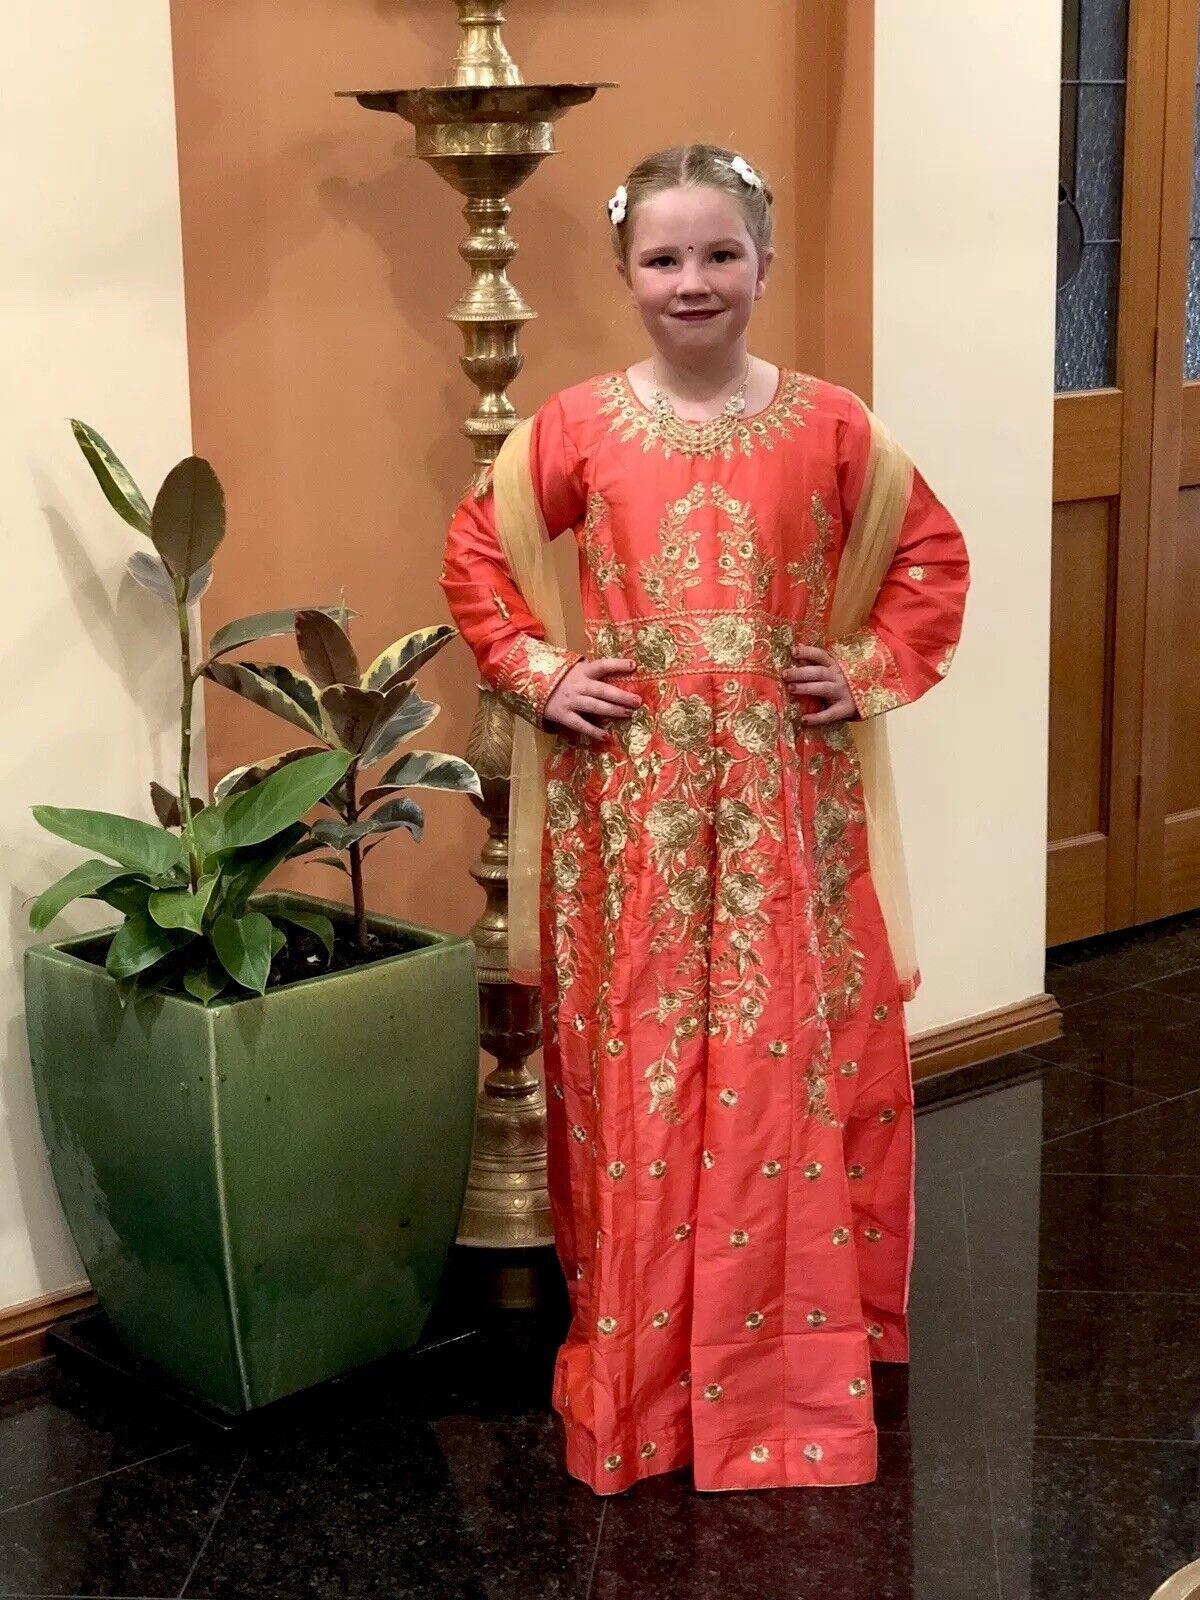 "24"" 24"" 24"" Size 3 4 Age Girls Salwar Kameez Indian Dress Kids Bollywood Peach gold A8 7beb66"